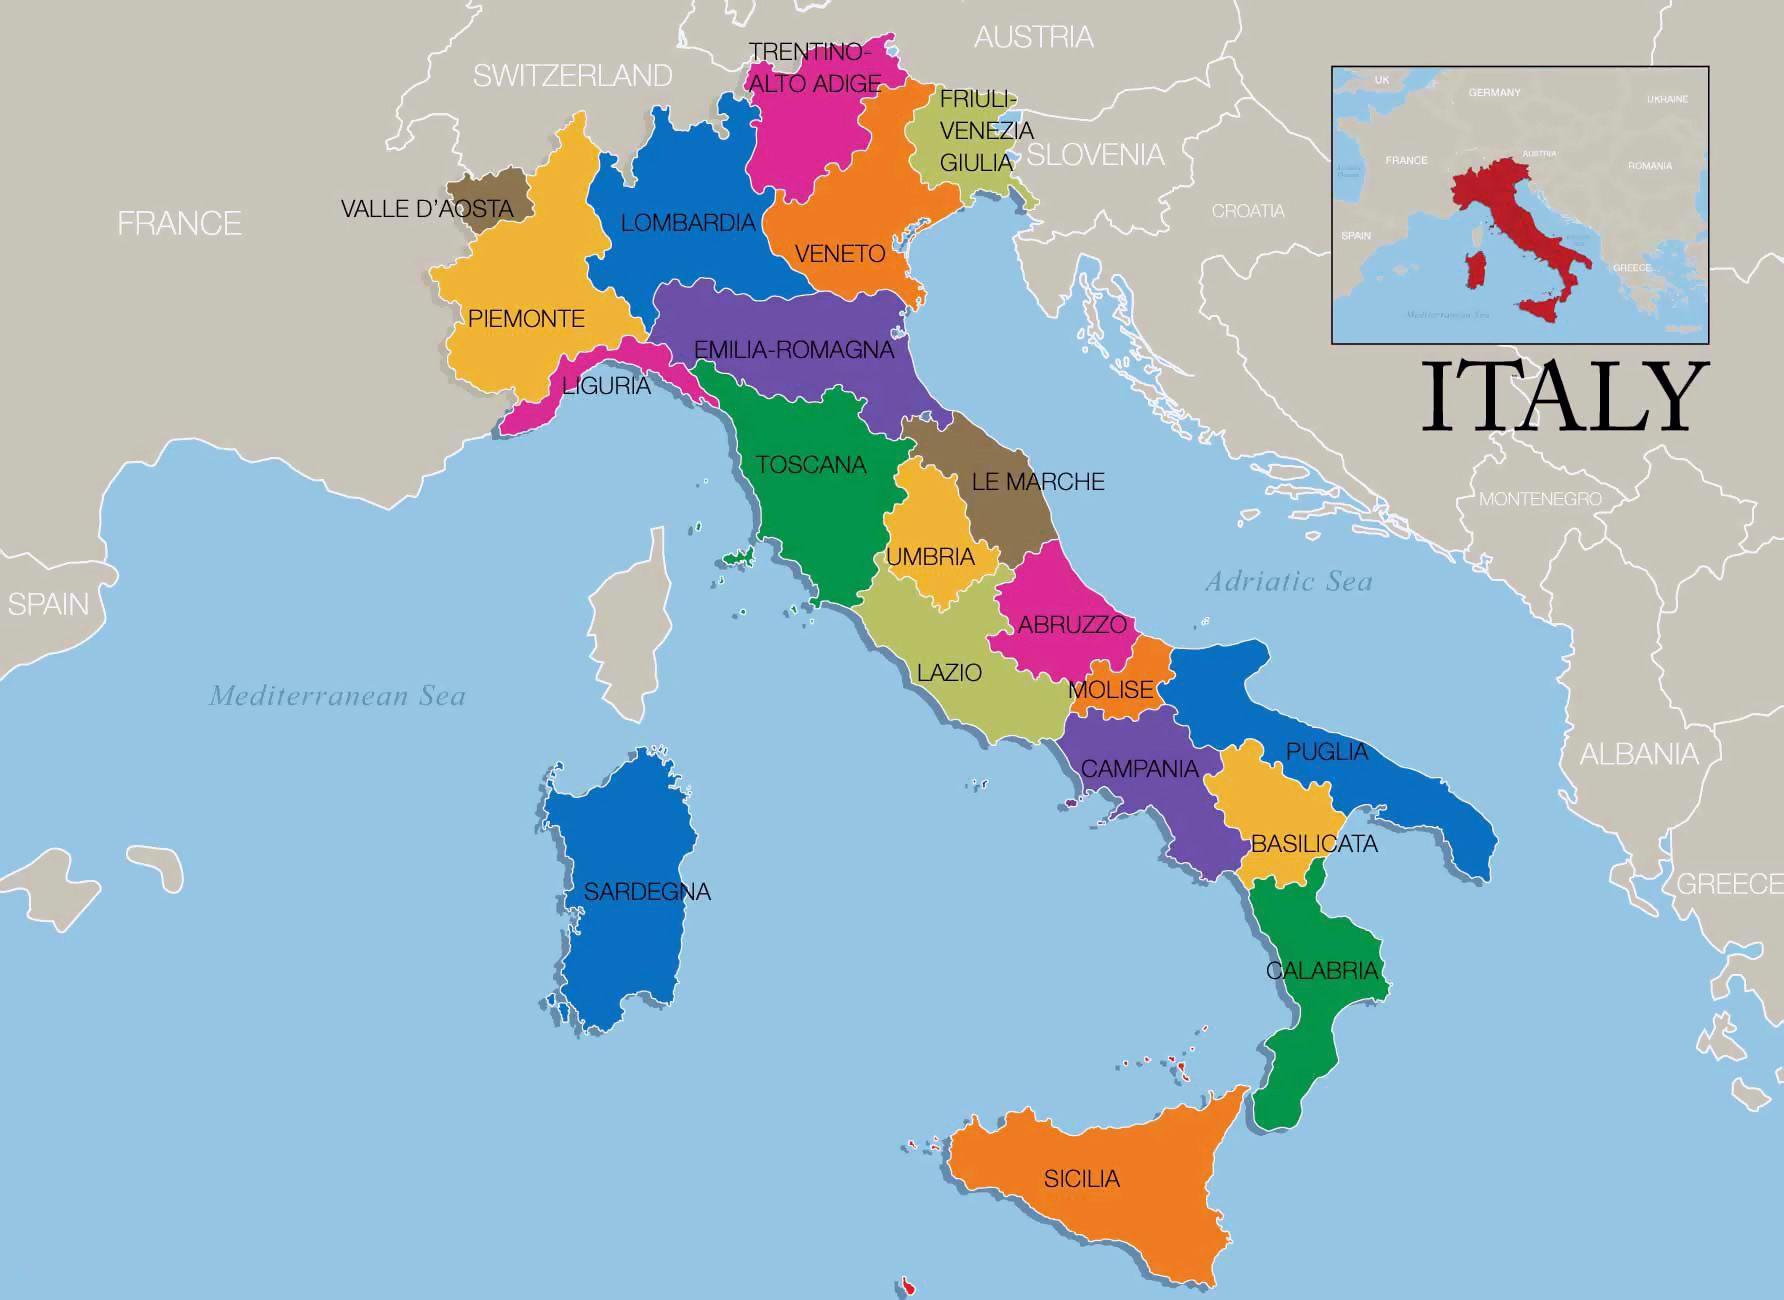 map of italy wine regions wine regions map of italy  vidianicom  - map of italy wine regions wine regions map of italy  vidianicom